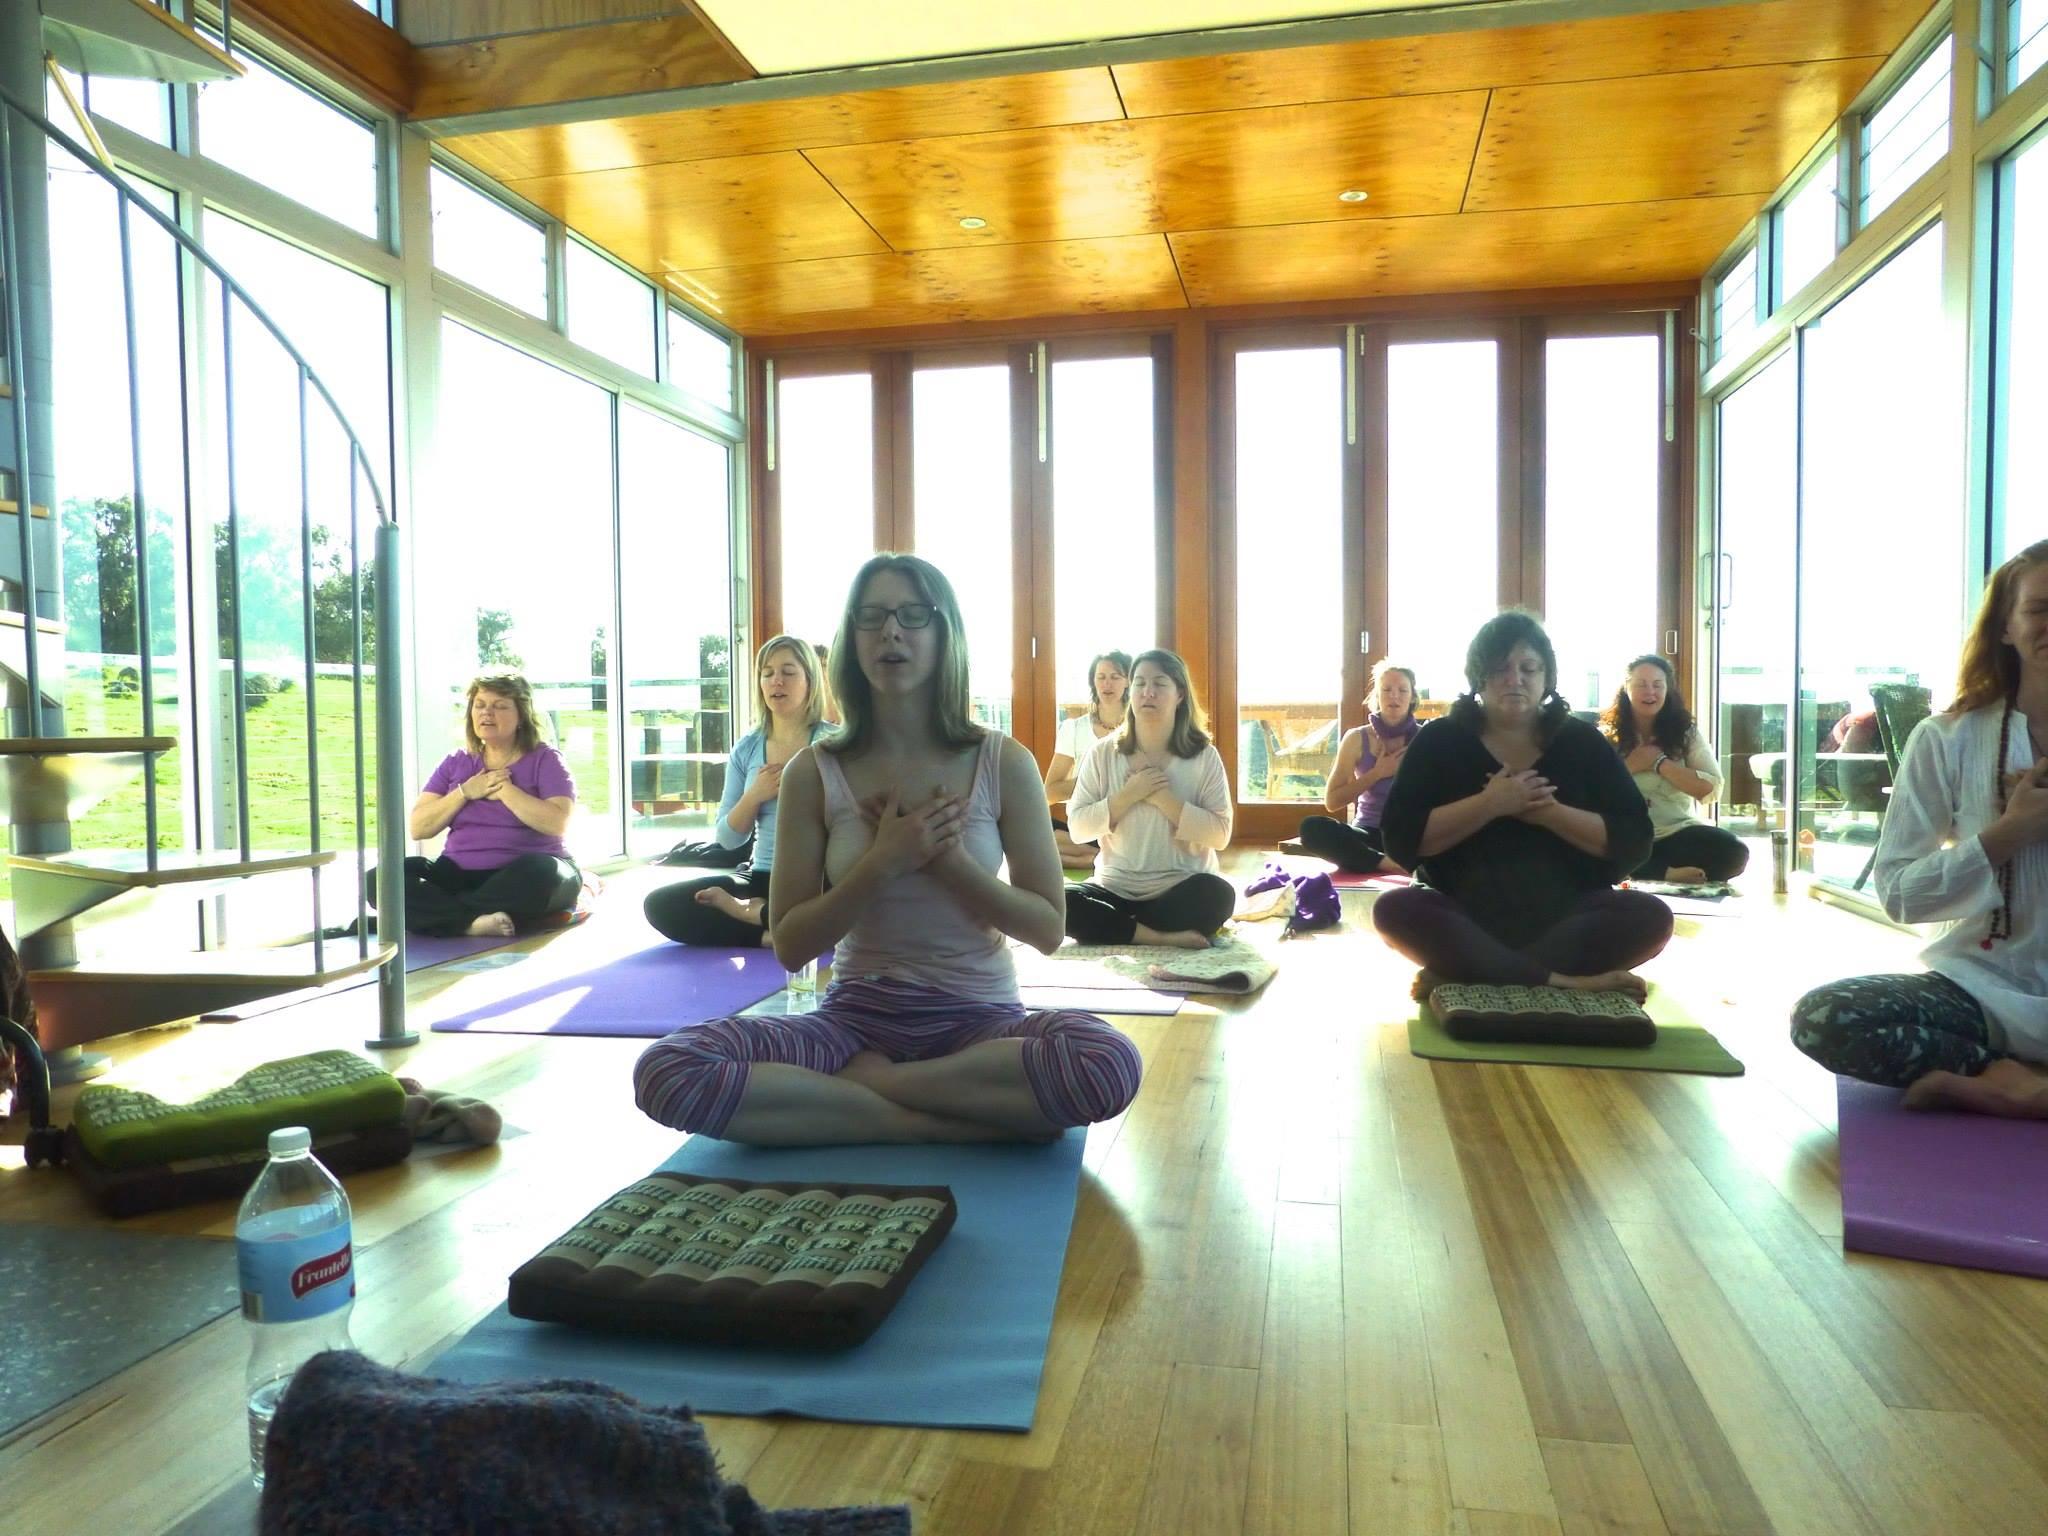 At the eco lodge - Sacred Women's Soul Retreat Kundalini Yoga class